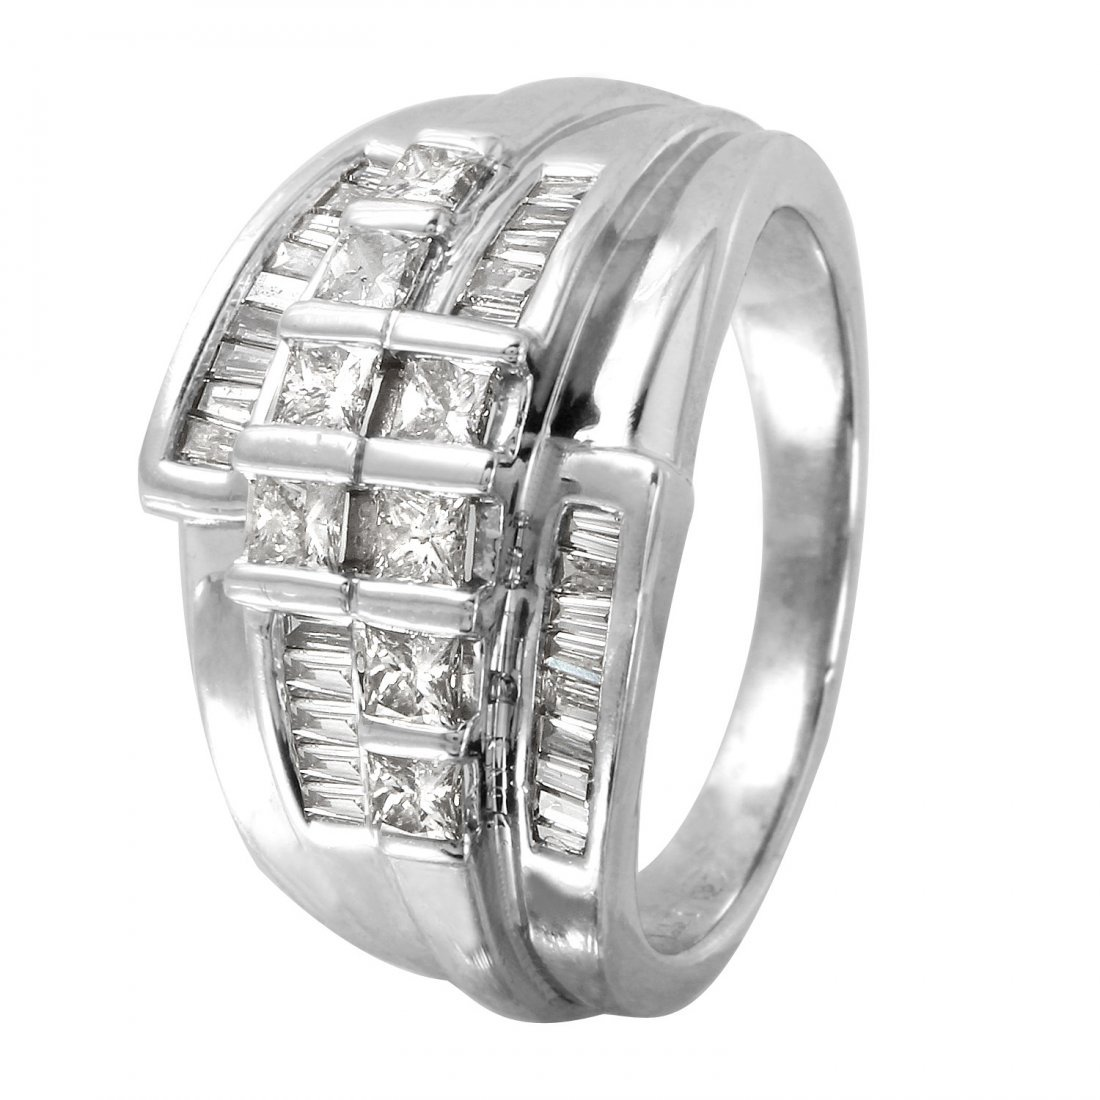 Ladies 1.22CTW Diamond 14K White Gold Ring